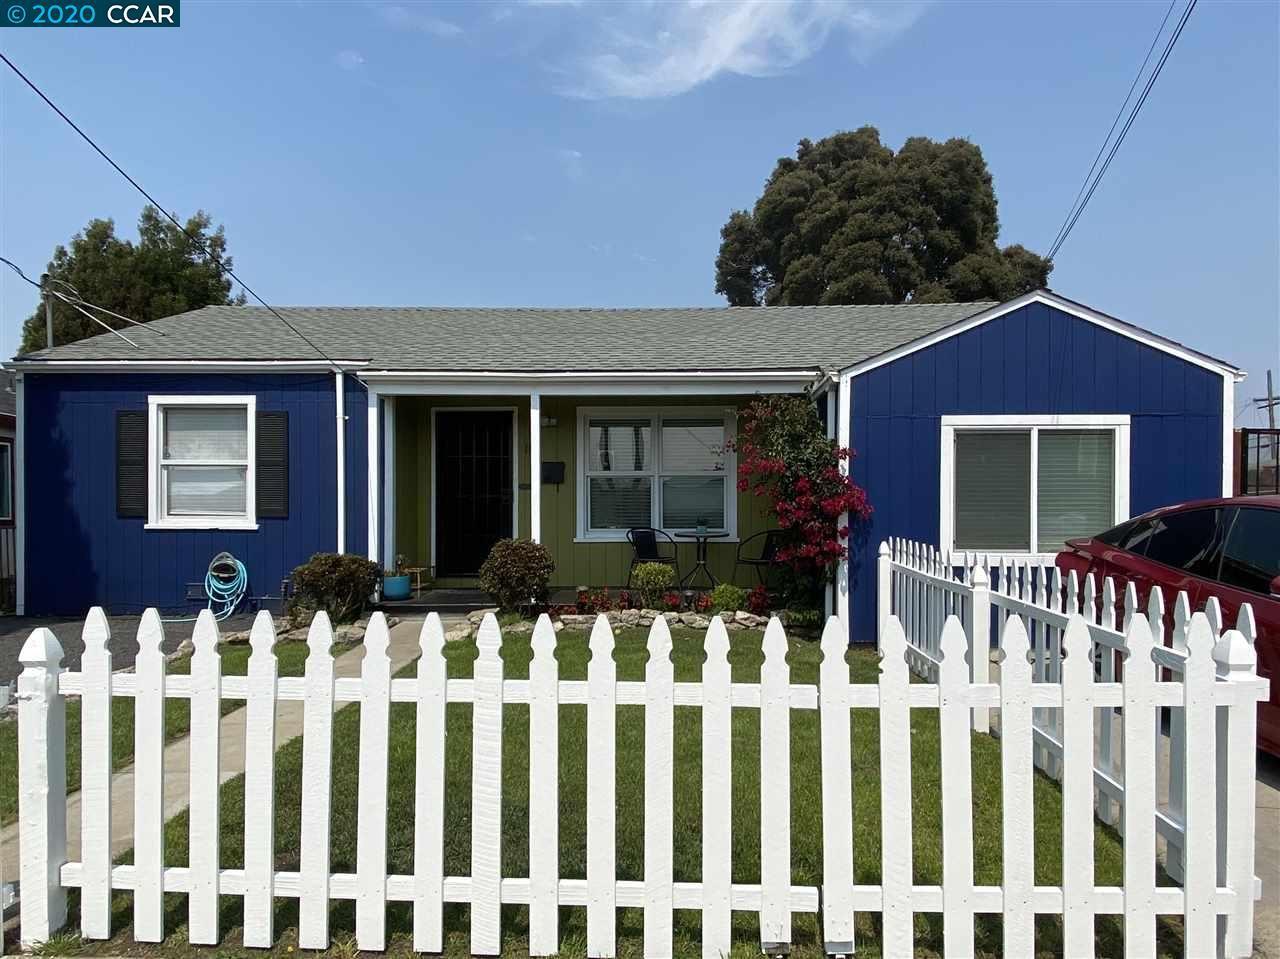 Photo for 1911 Virginia Ave, RICHMOND, CA 94804 (MLS # 40925774)